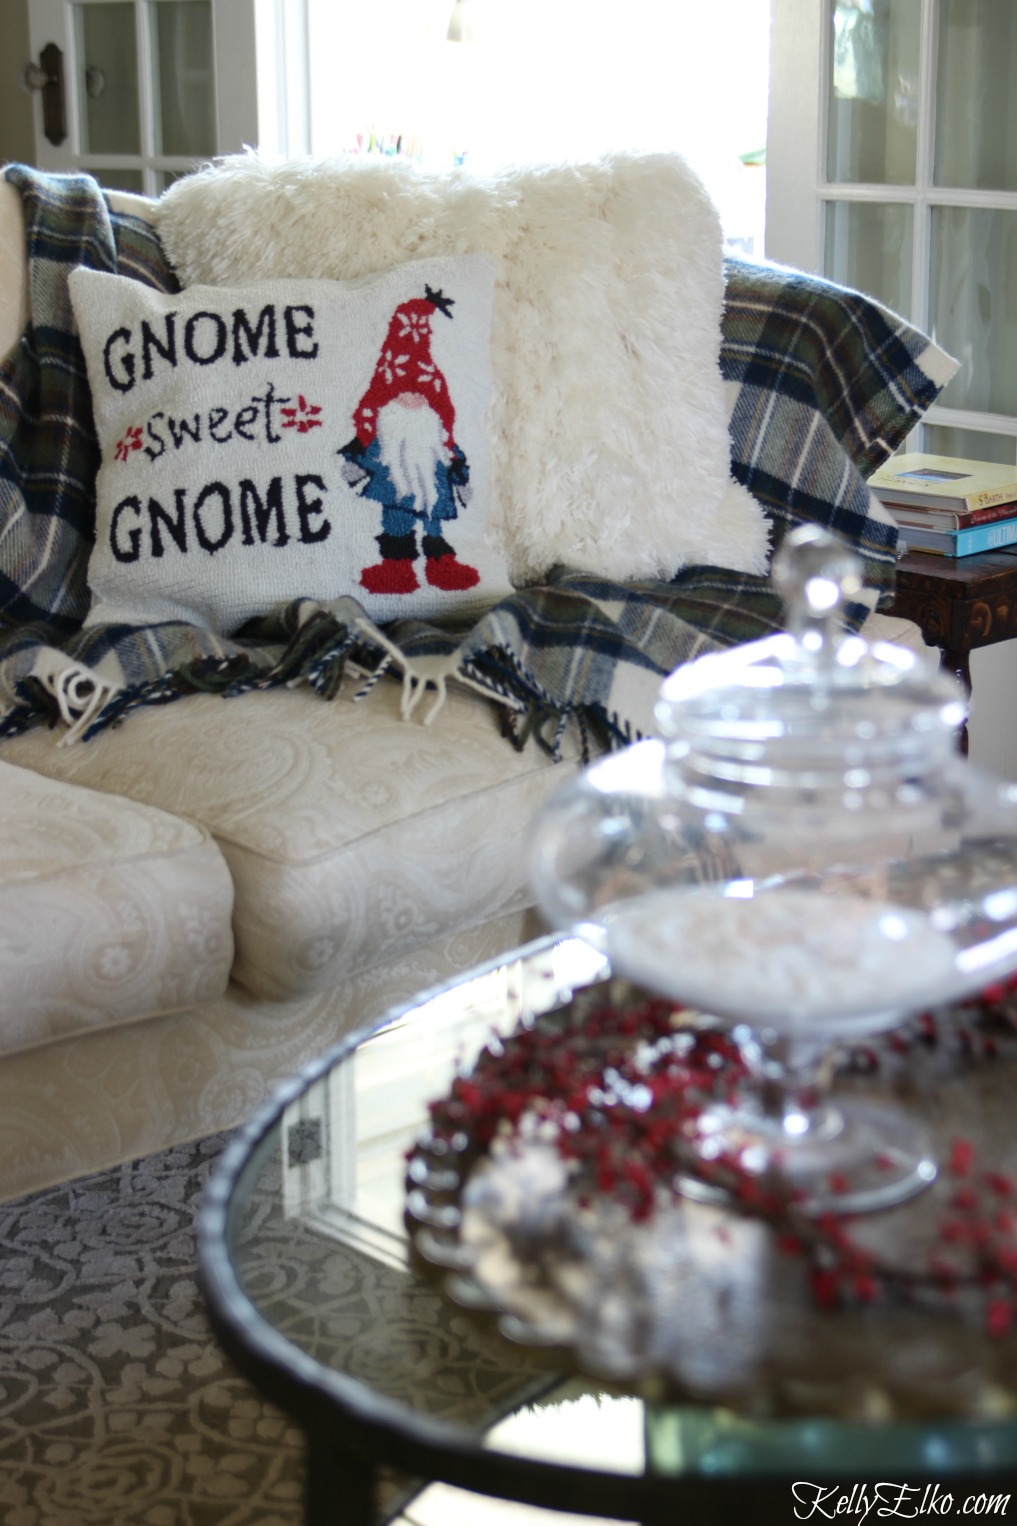 Gnome Sweet Gnome pillow kellyelko.com